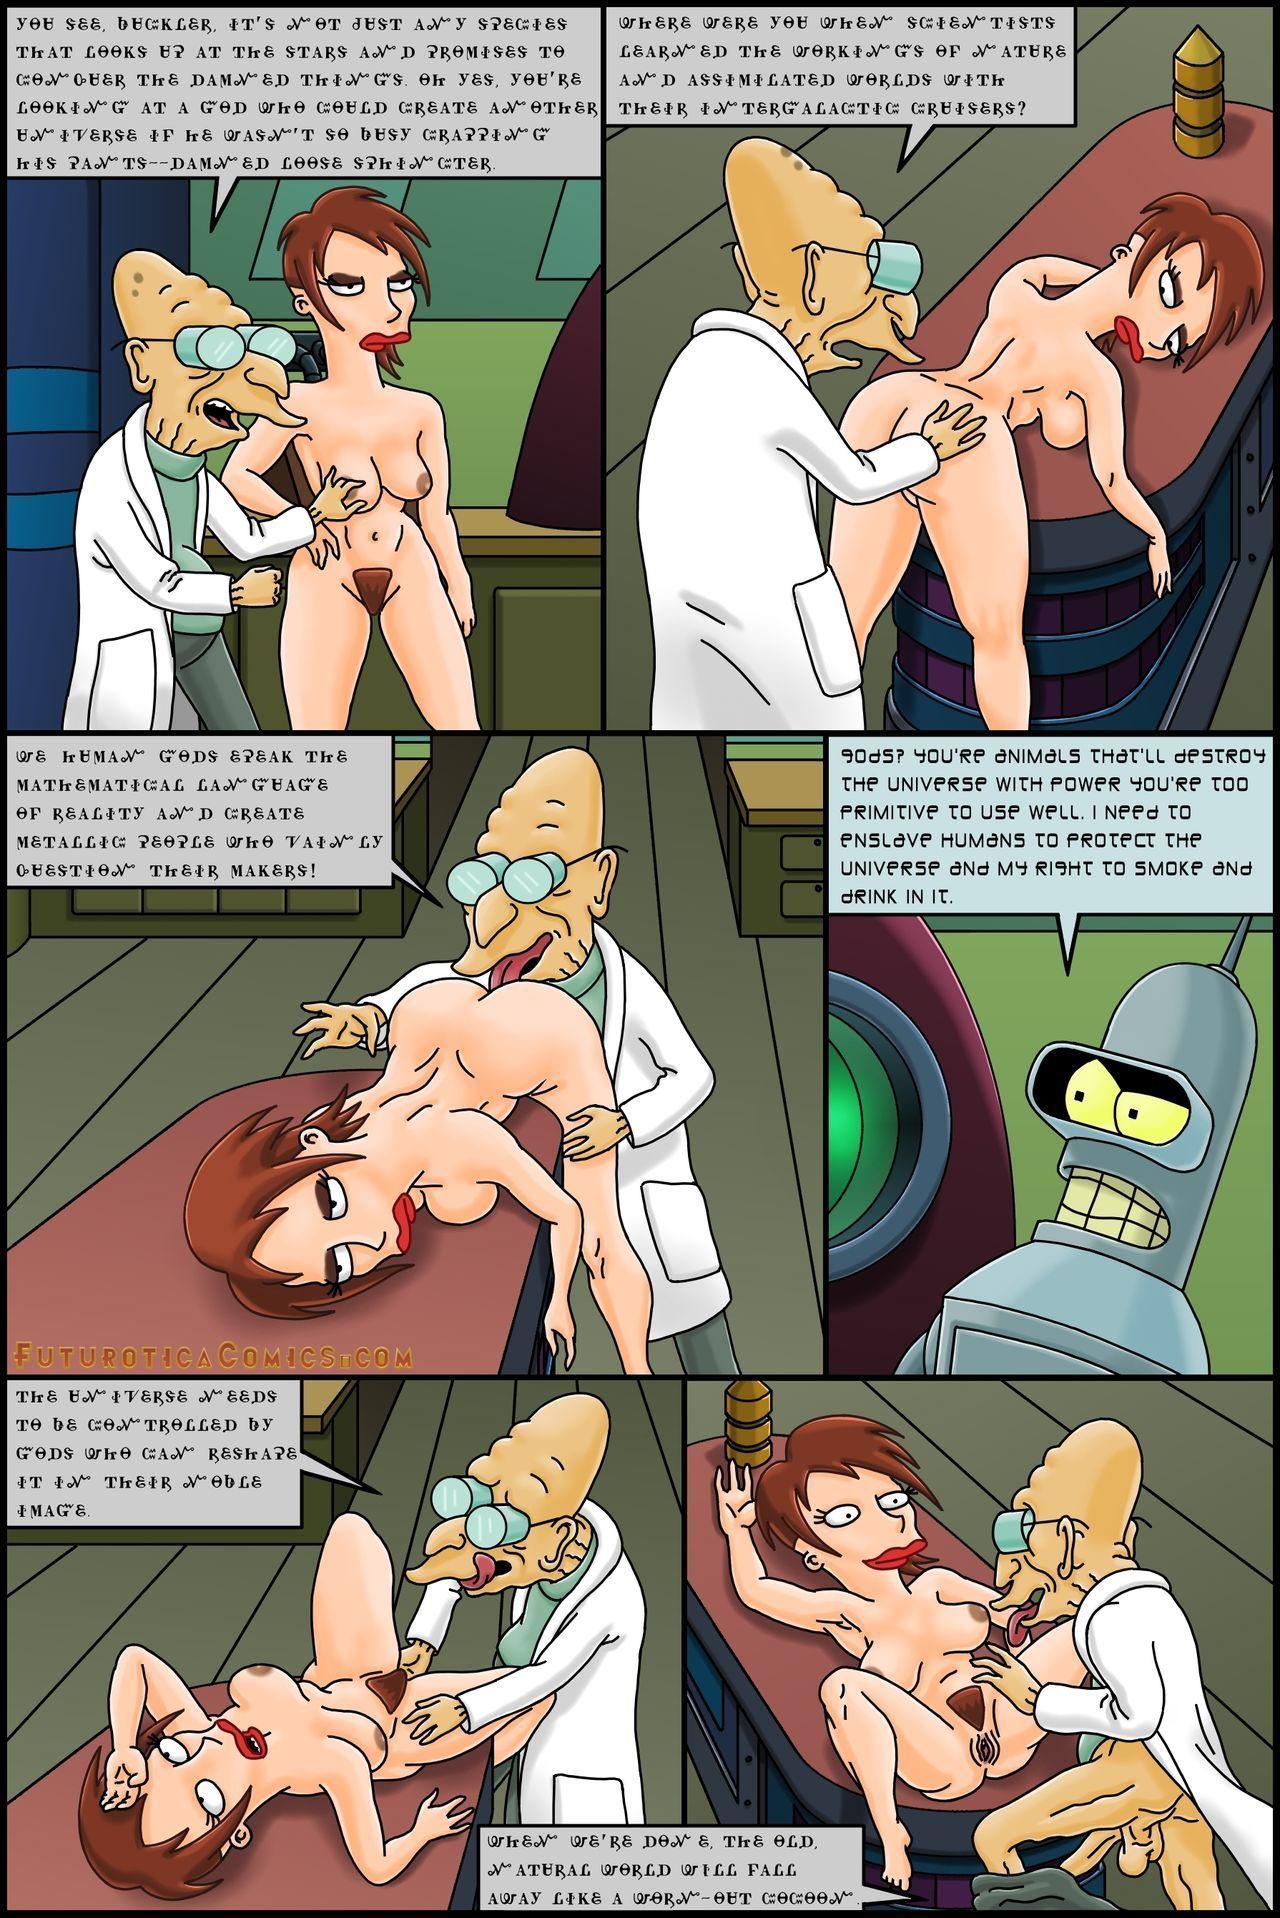 Futurotica Comics (Futurama and Star Trek Parodies)